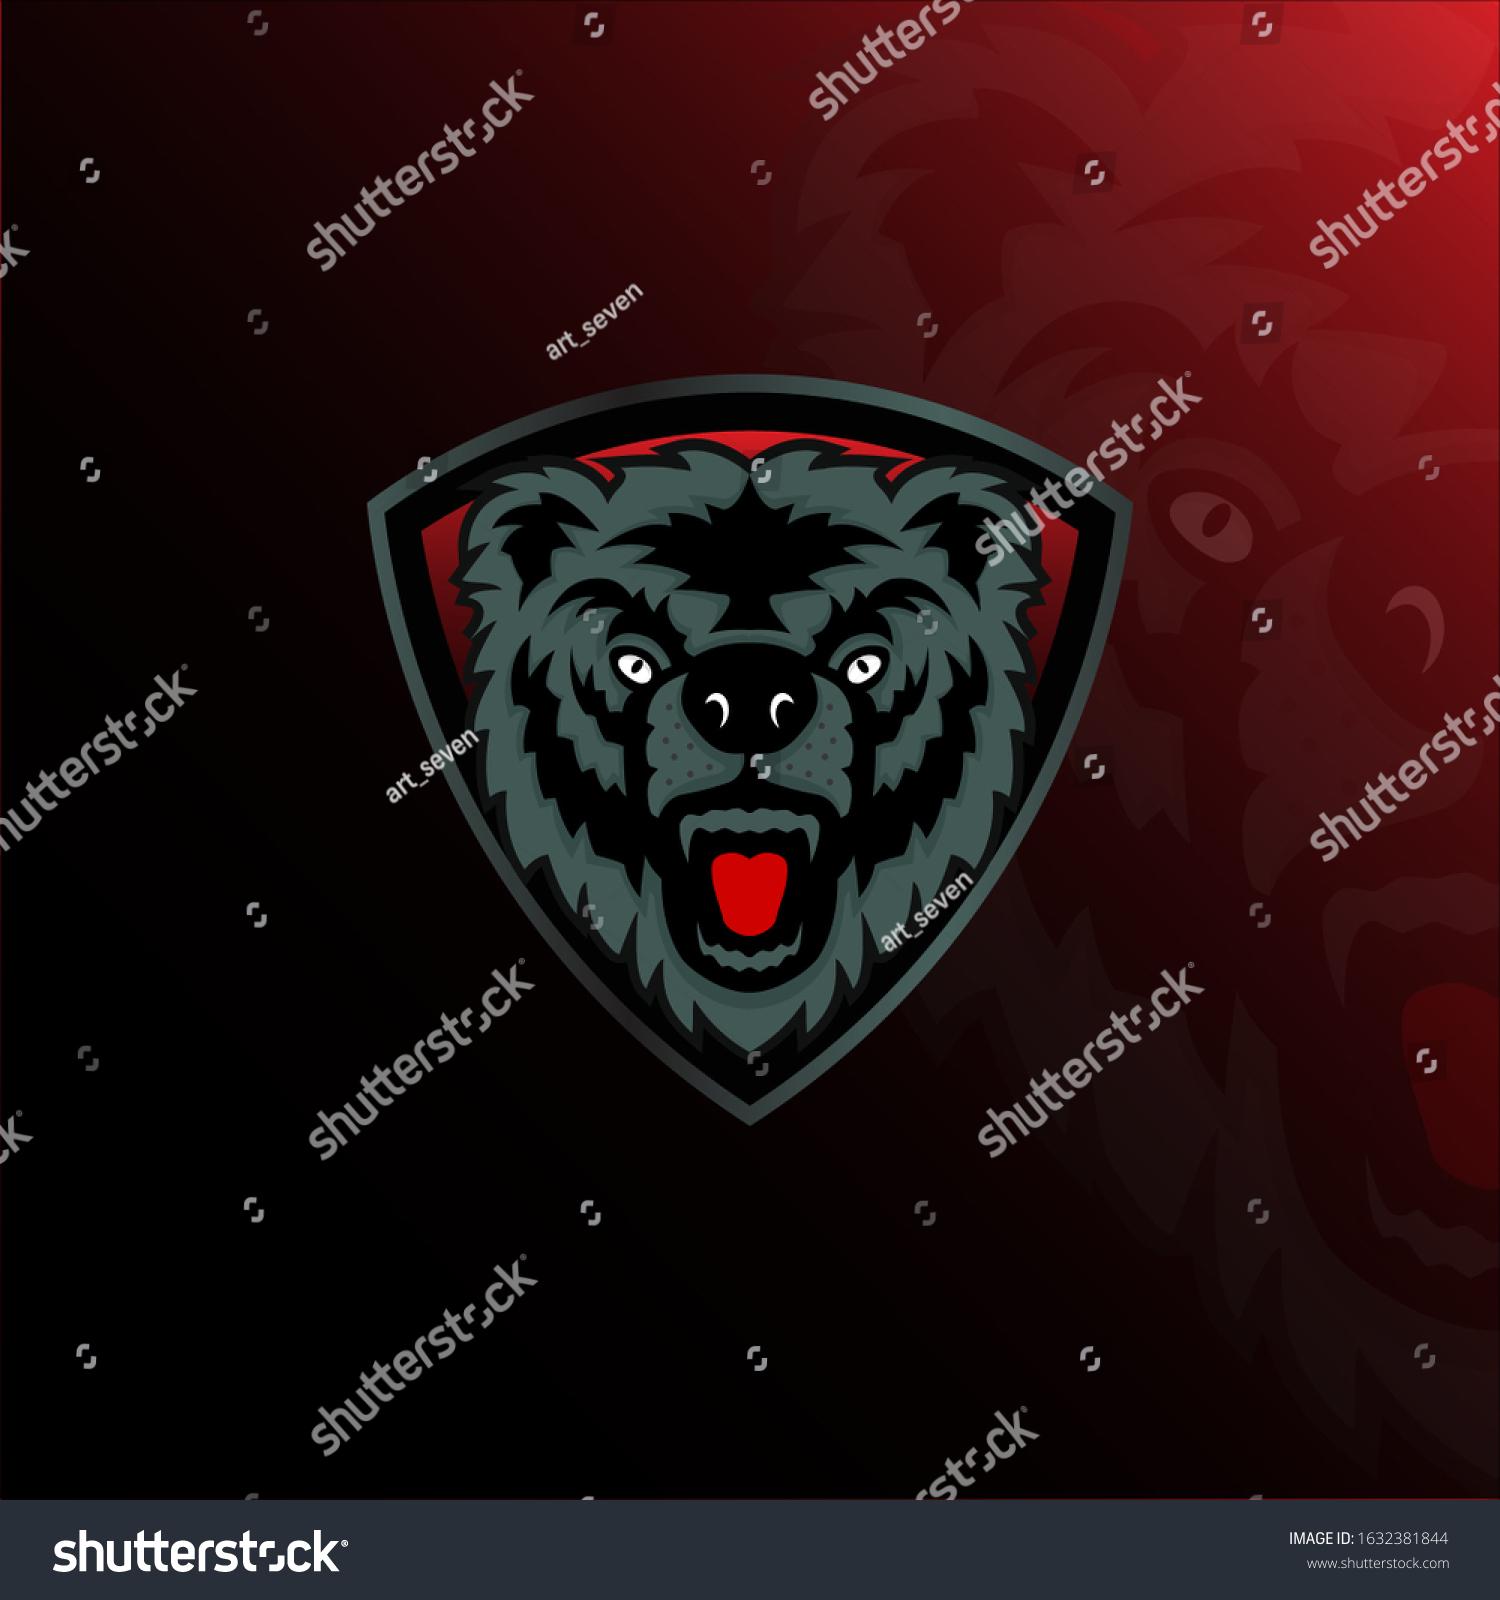 esport logo wolf vector dark background stock vector royalty free 1632381844 https www shutterstock com image vector esport logo wolf vector dark background 1632381844